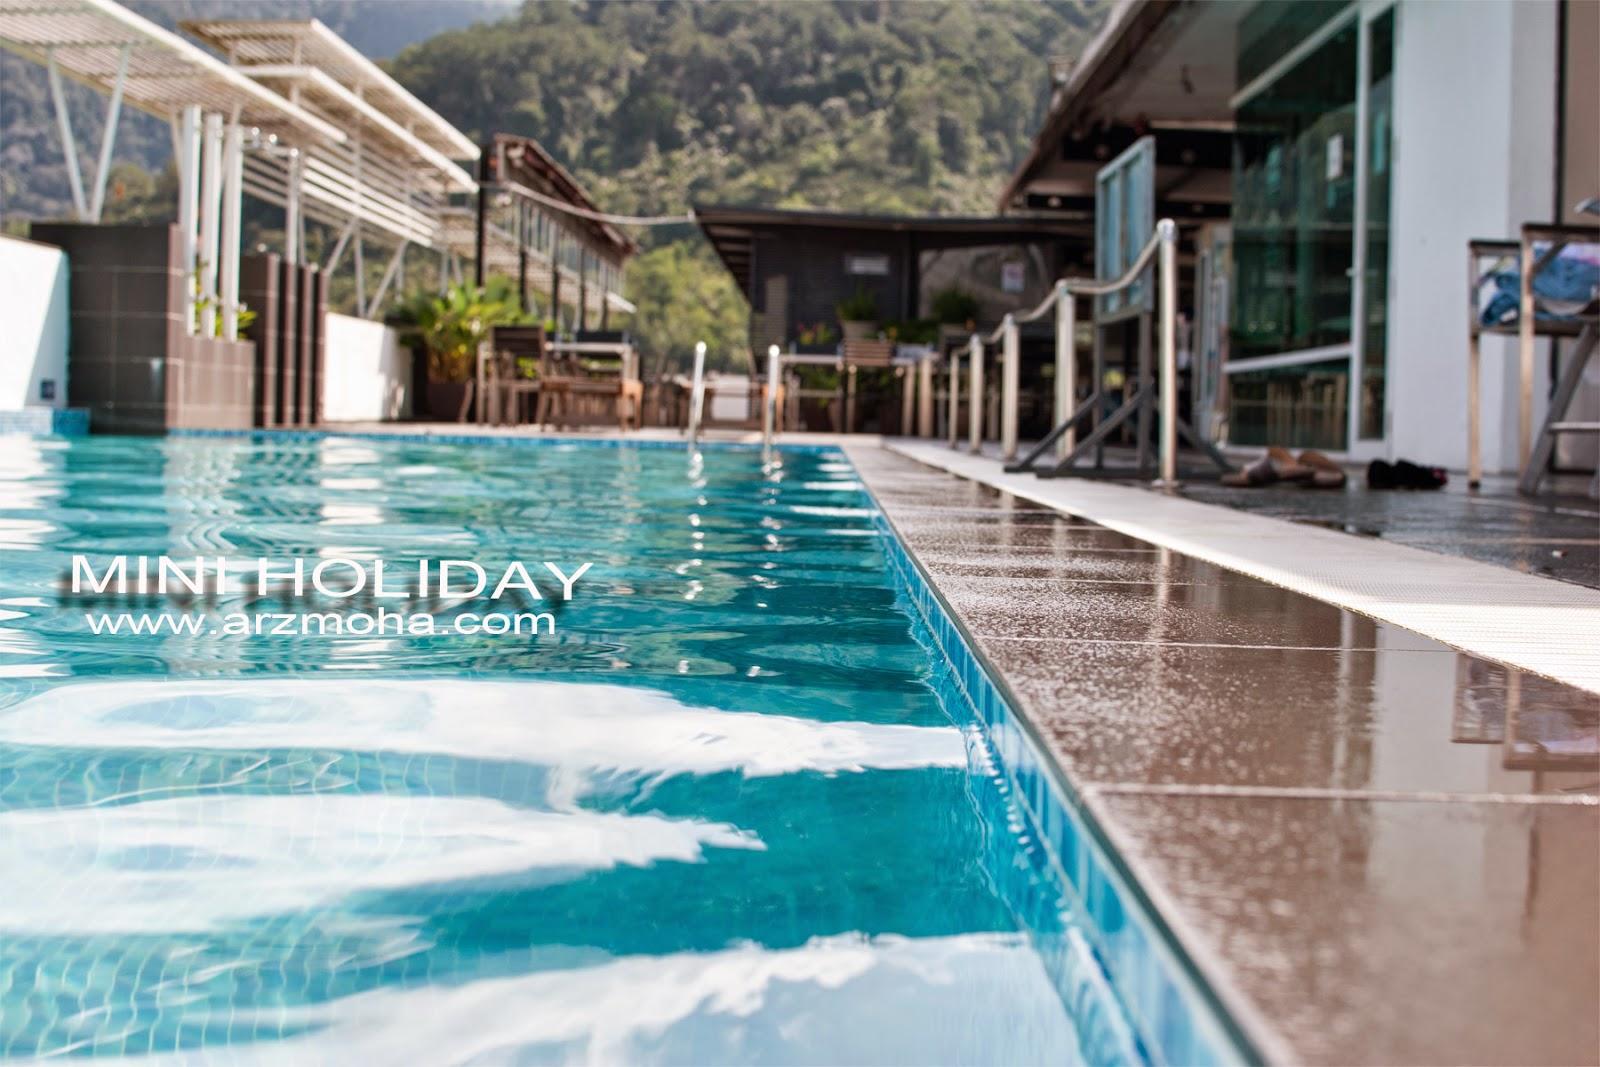 Mini, Holiday, Flemington, hotel, swimming pool, gambar cantik, arzmoha, jurugambar perkahwinan, landscape, visit malaysia, visit perak